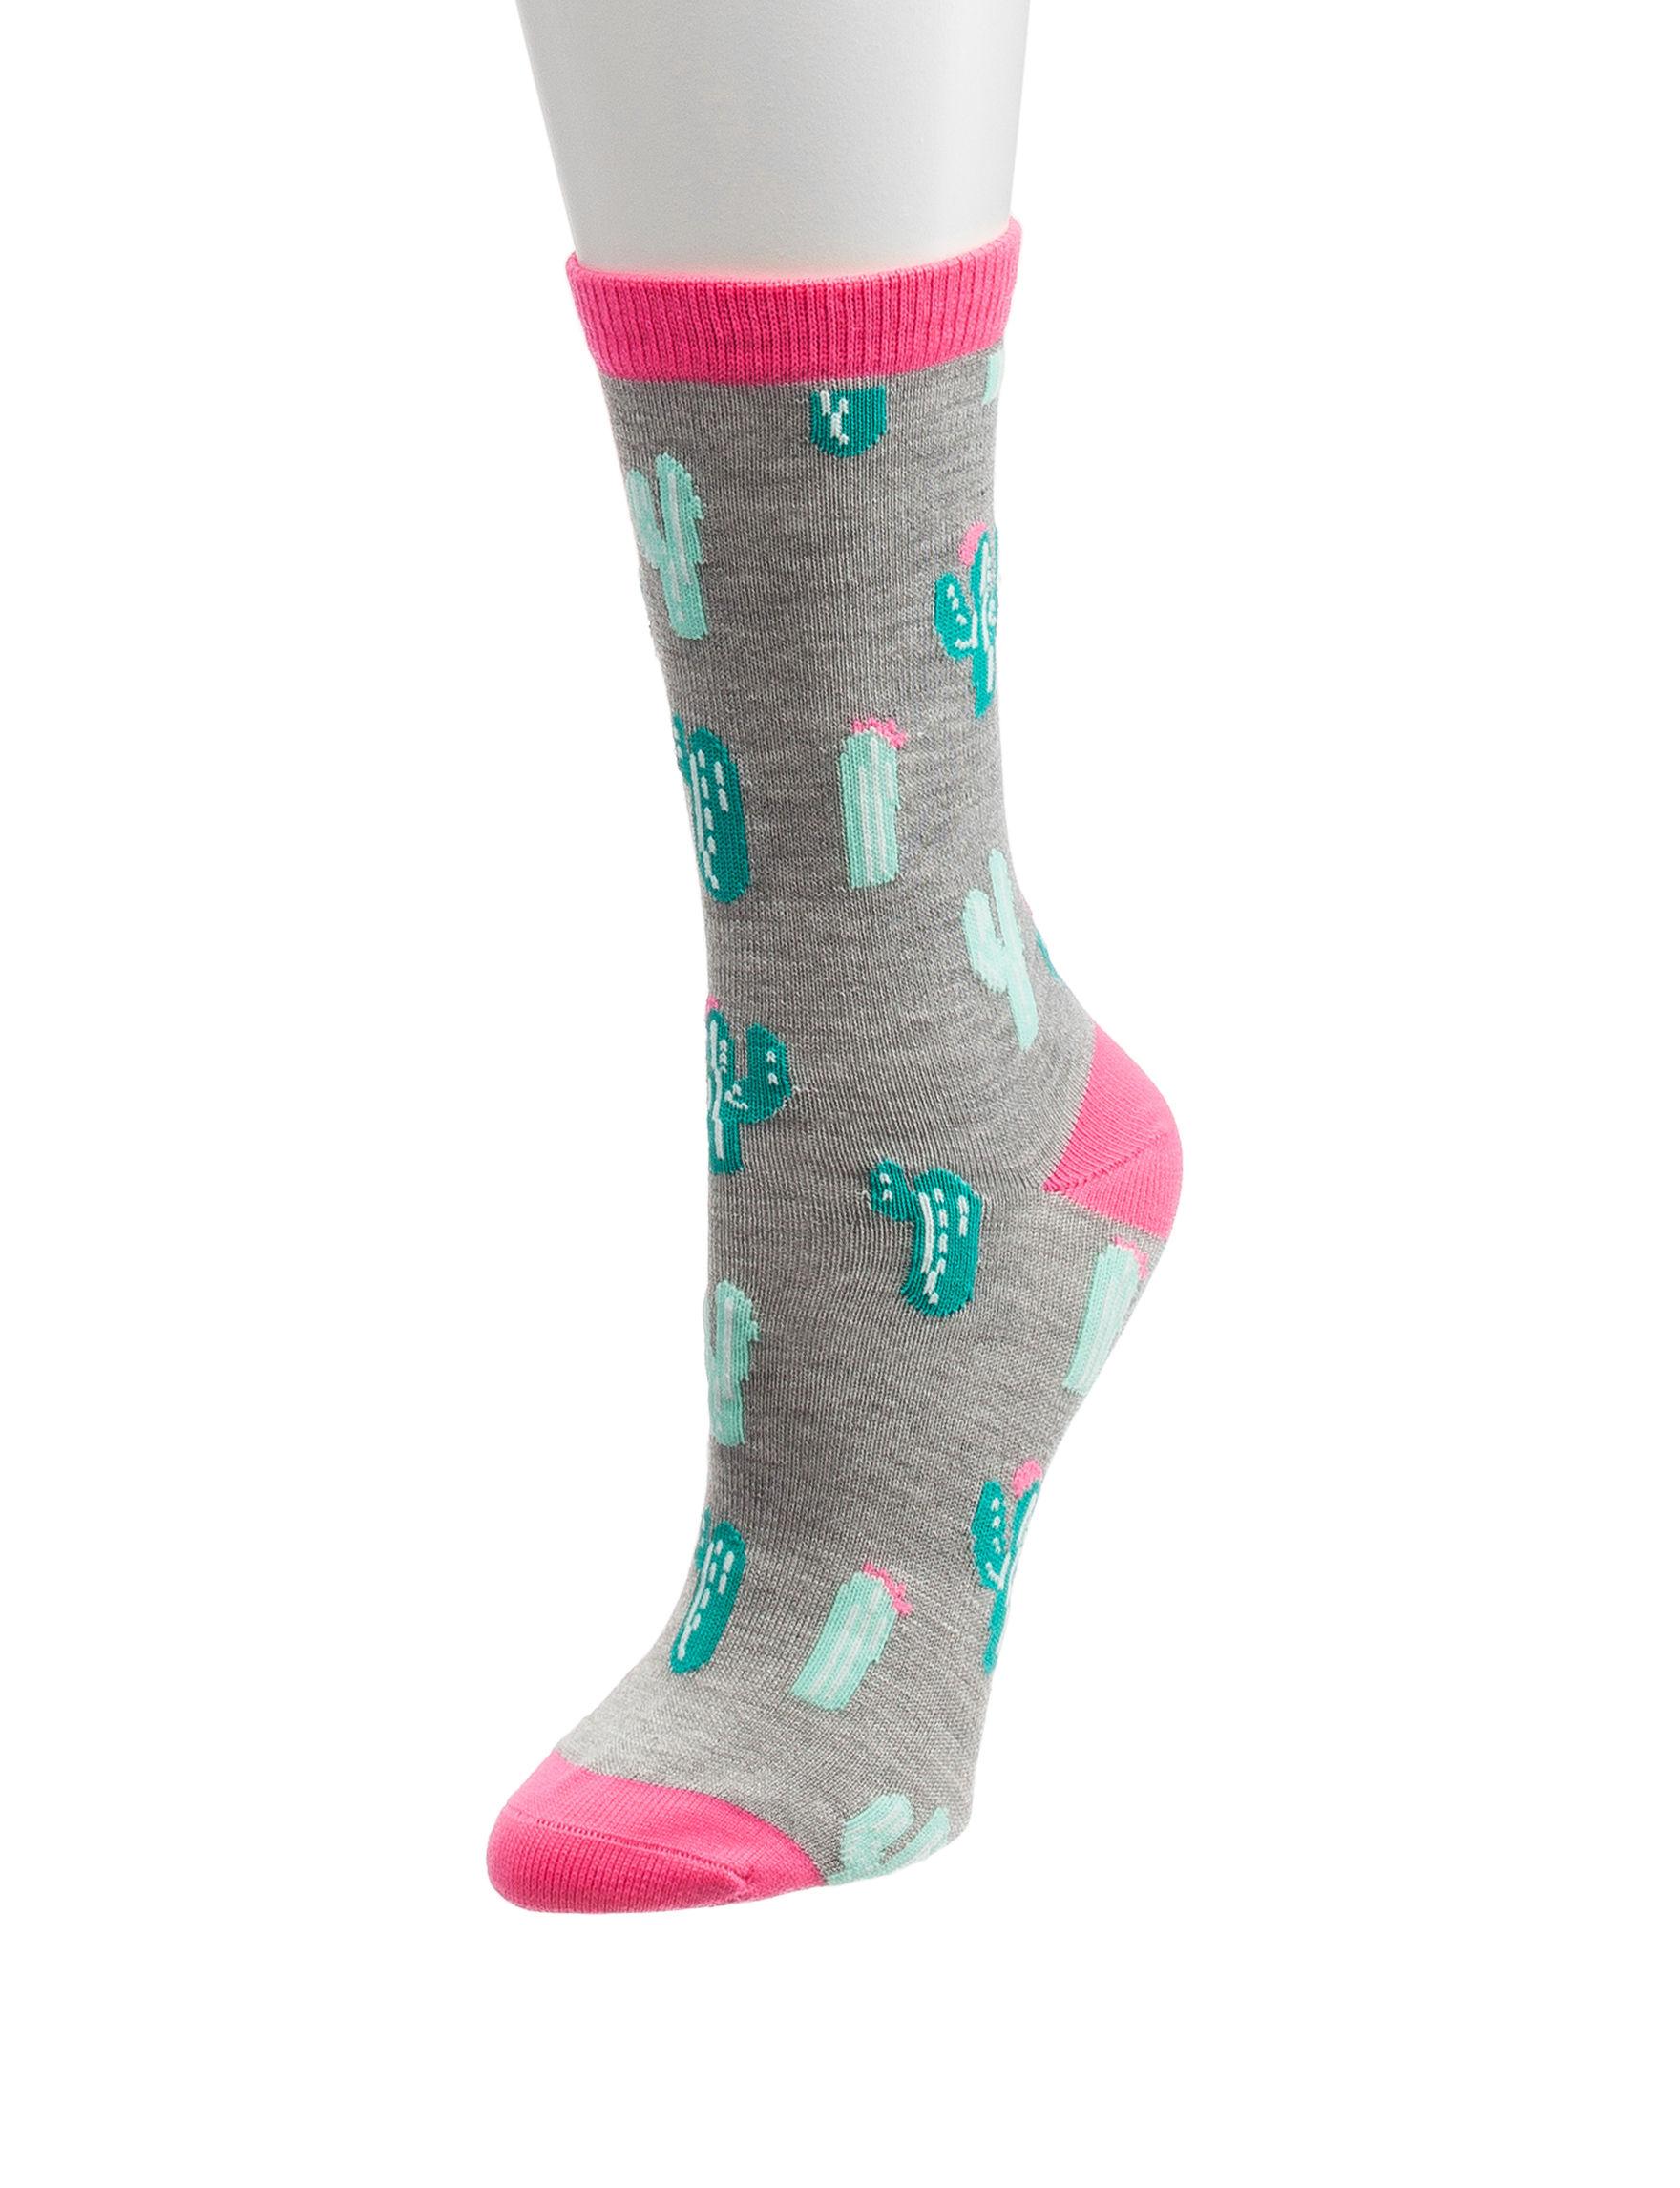 HS by Happy Socks Grey Socks